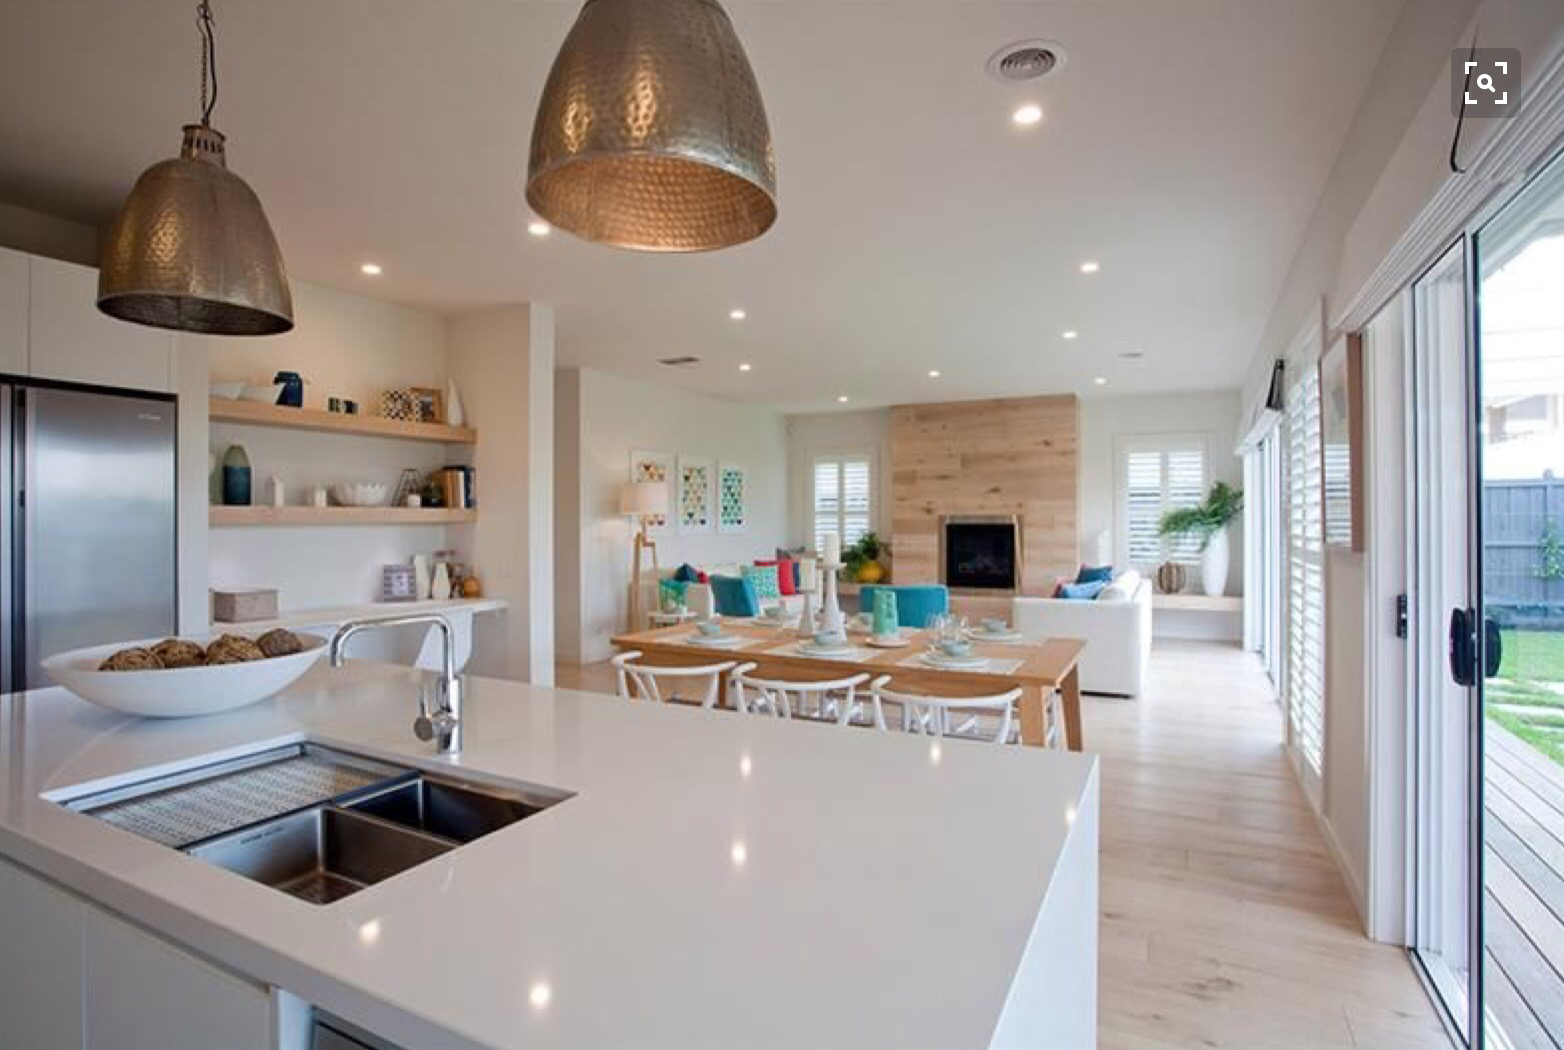 Kitchen Diner Living Area Extension Plans Tammymum